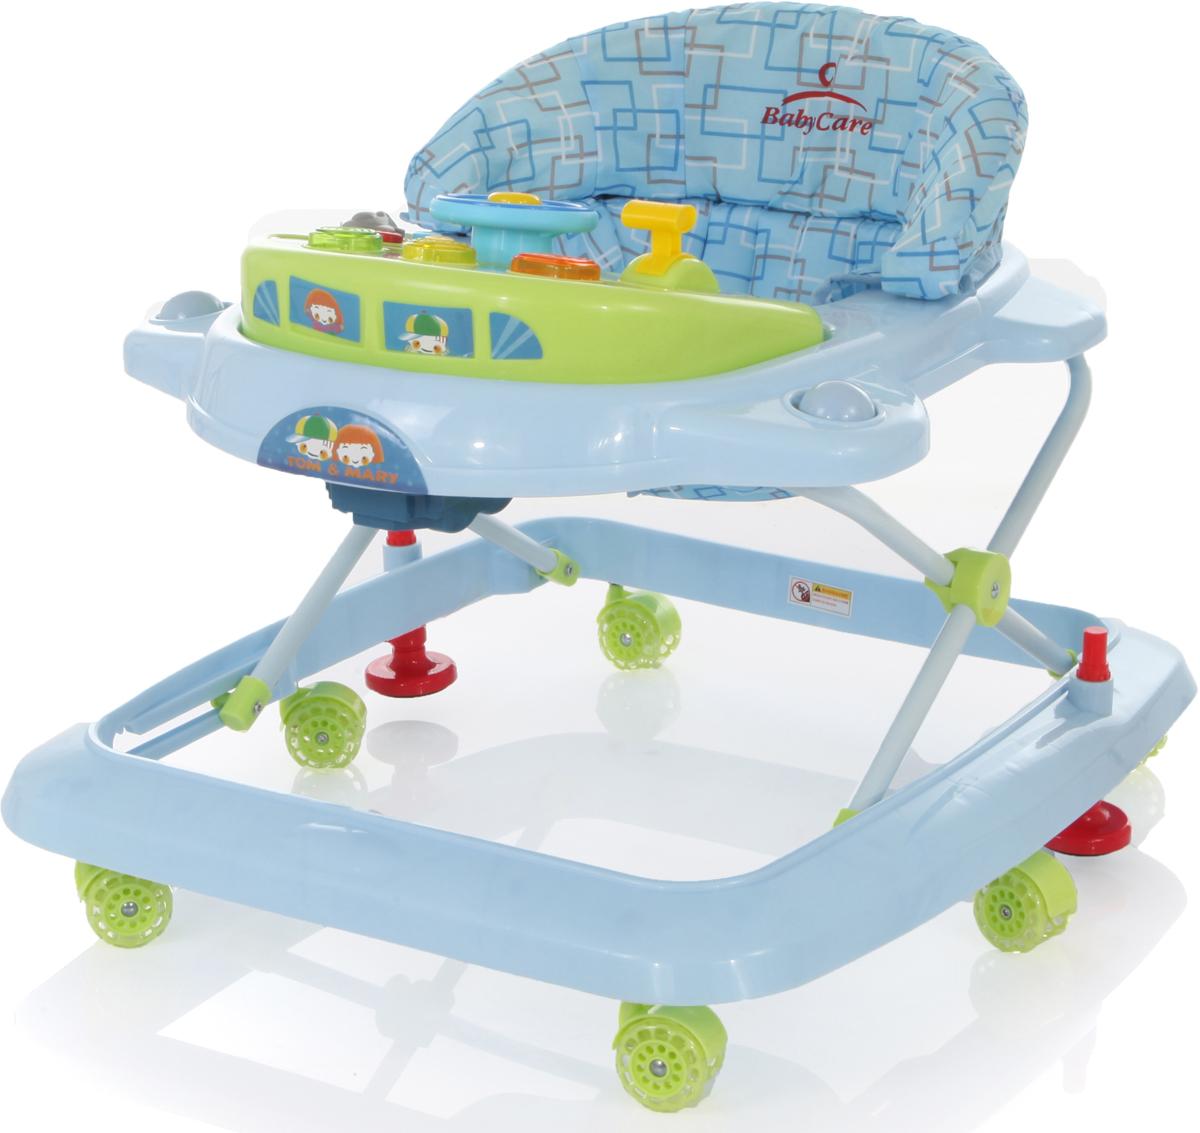 все цены на Ходунки Baby Care Tom&Mary, J-205, синий зеленый онлайн